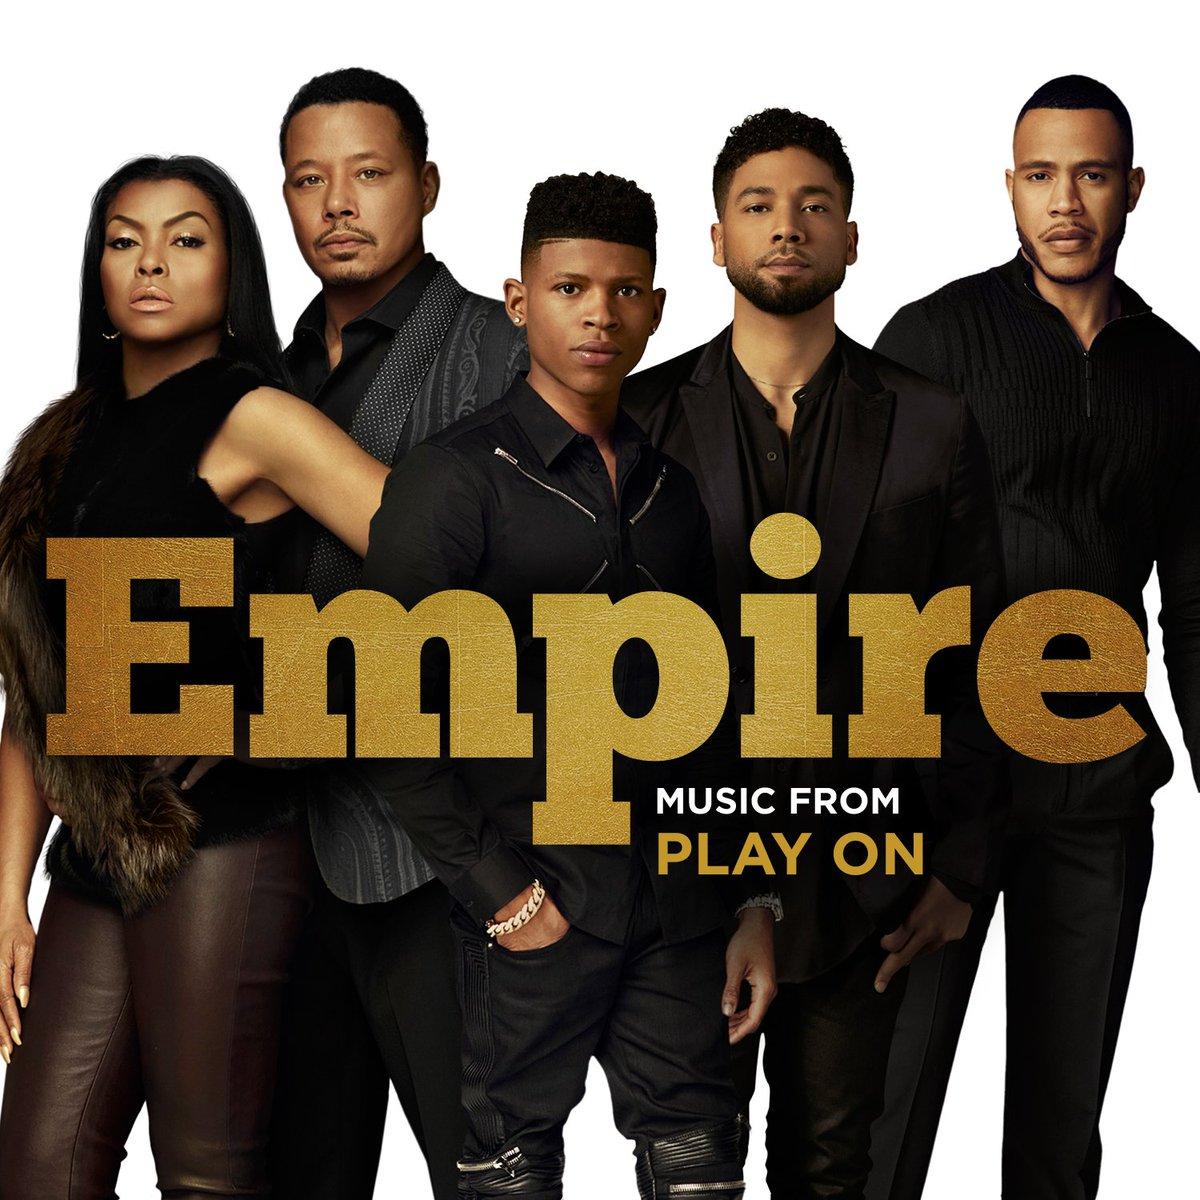 RT @EmpireFOX: Can't get enough #Empire music? Listen here. https://t.co/J5YkFjne24 https://t.co/3kkwzHvN6W